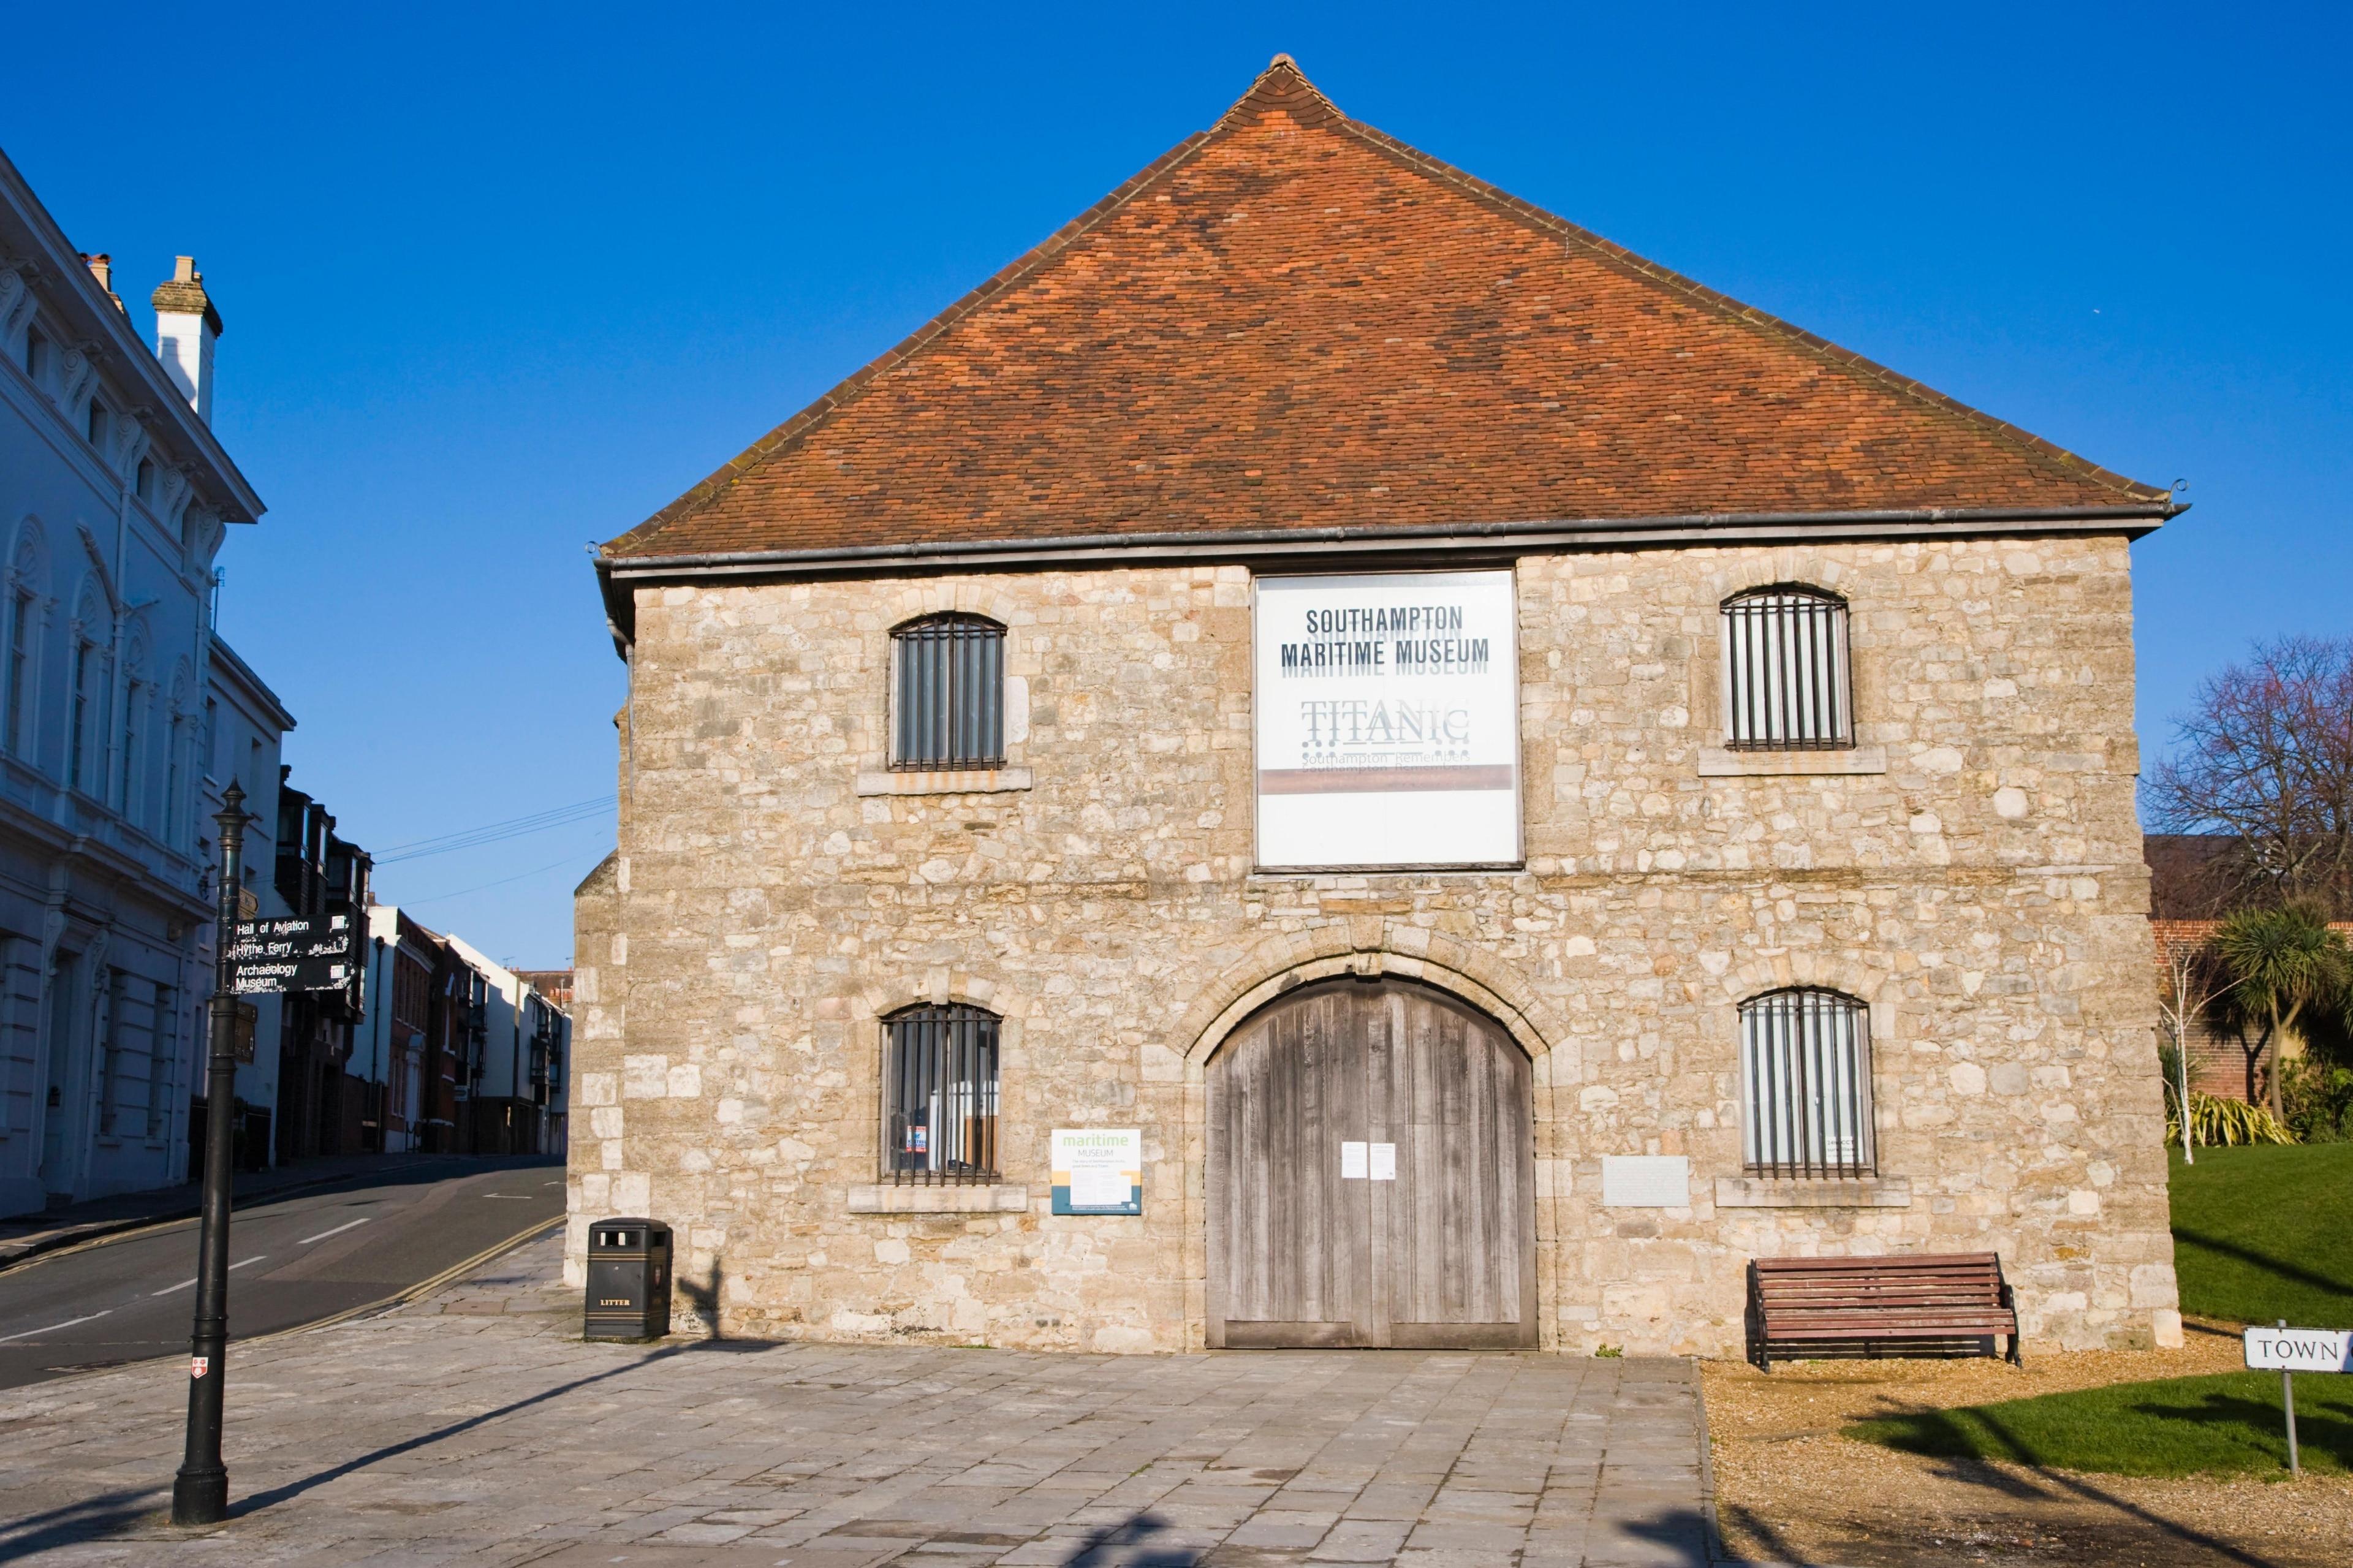 Southampton Maritime Museum, Southampton, England, United Kingdom